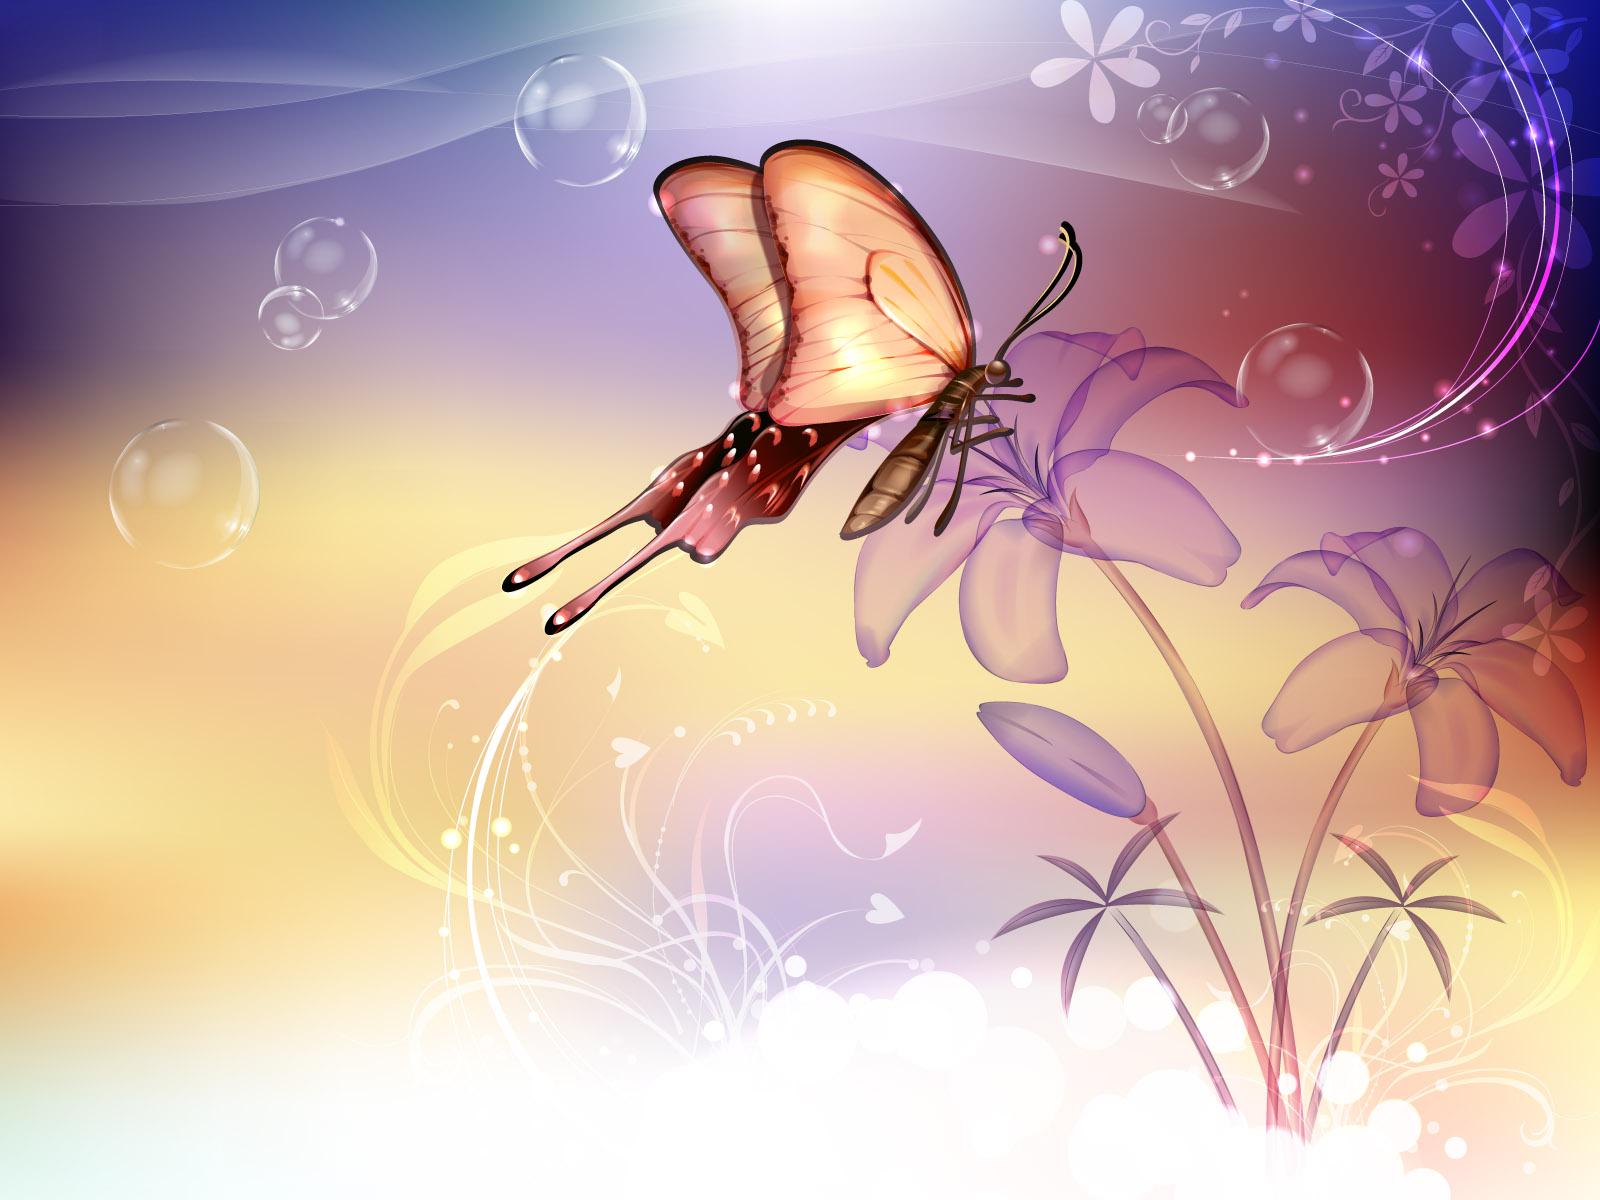 Butterfly   Wallpapers Butterfly Wallpaper Backgrounds 1600x1200